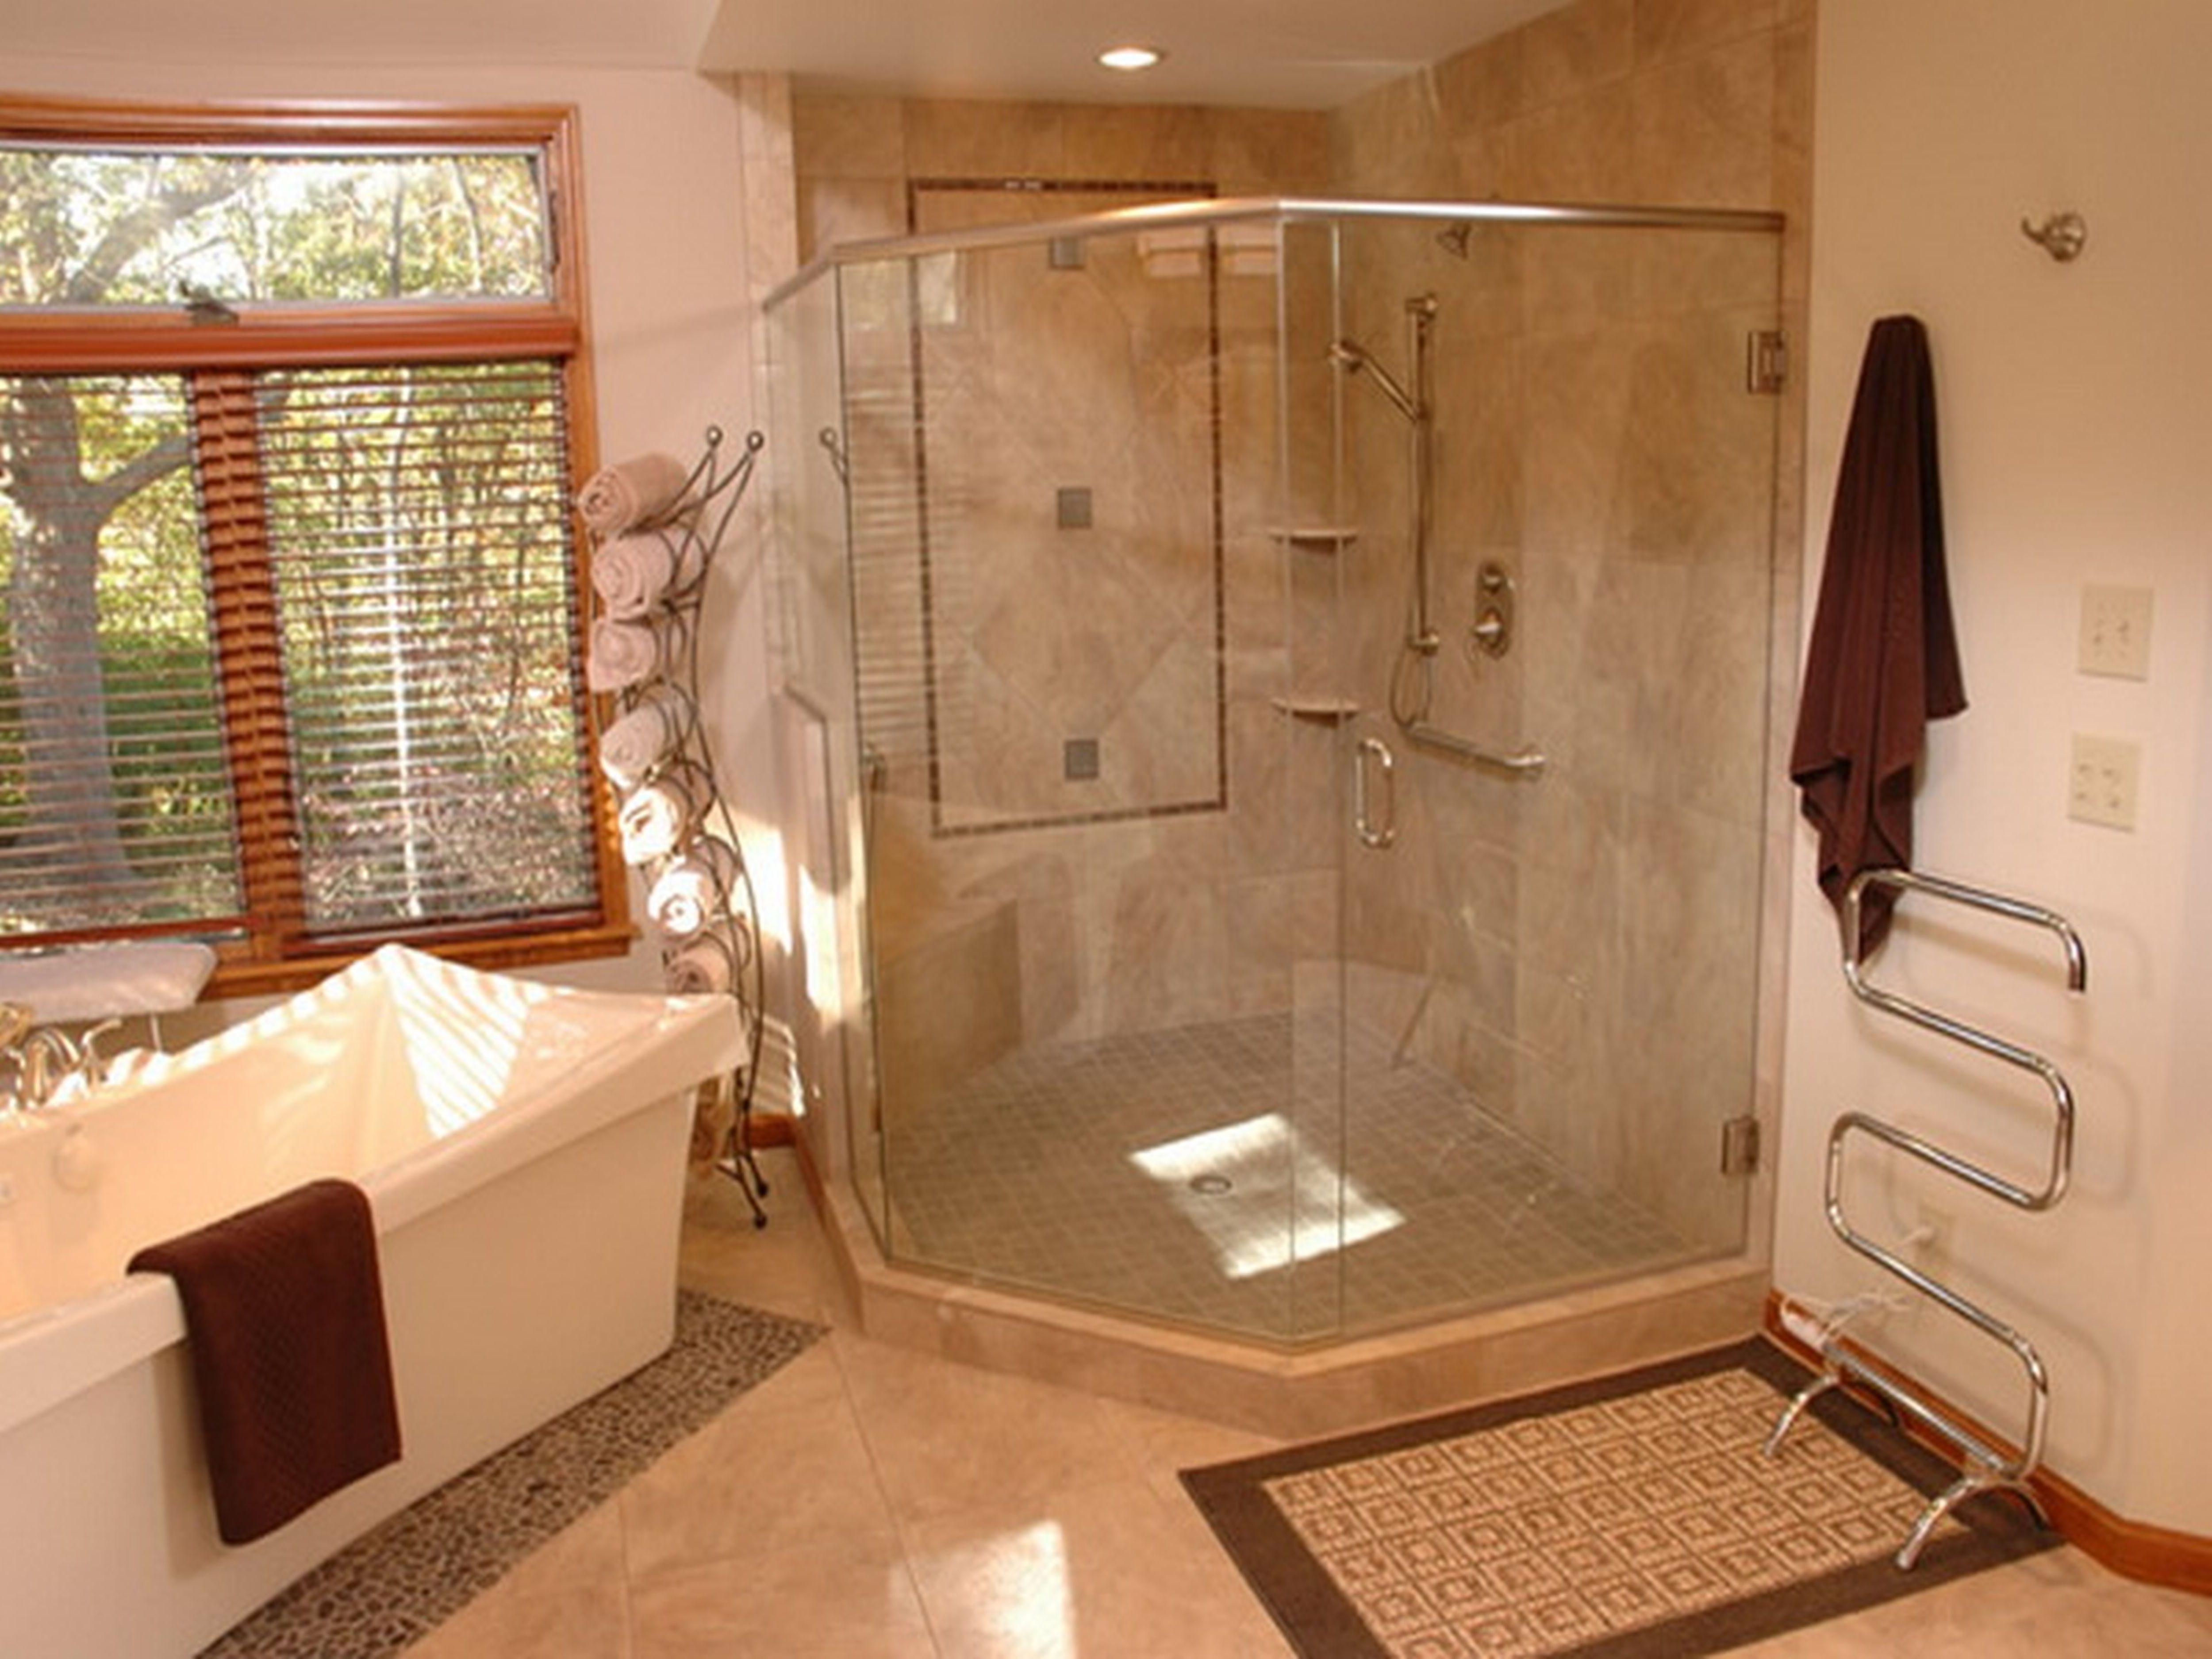 small sink ideas - Google Search | Master bathroom shower ...